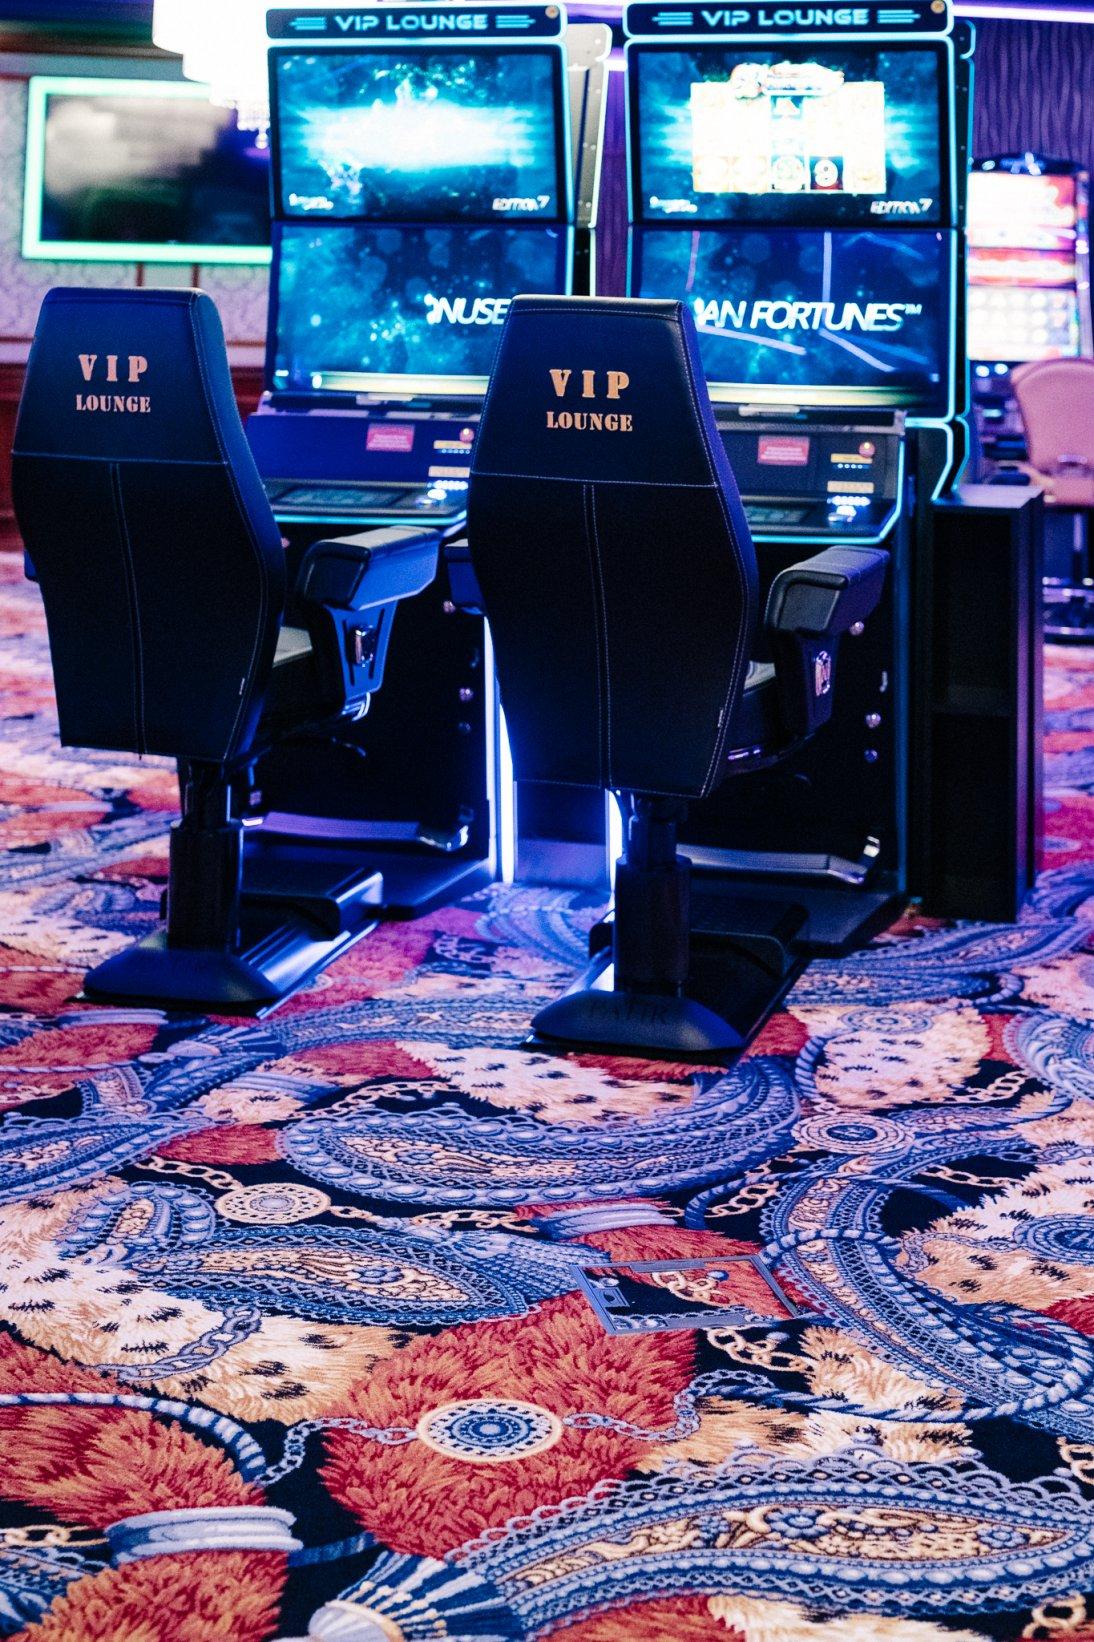 20200608-casino-veranda-copyright-vanillaroads-011